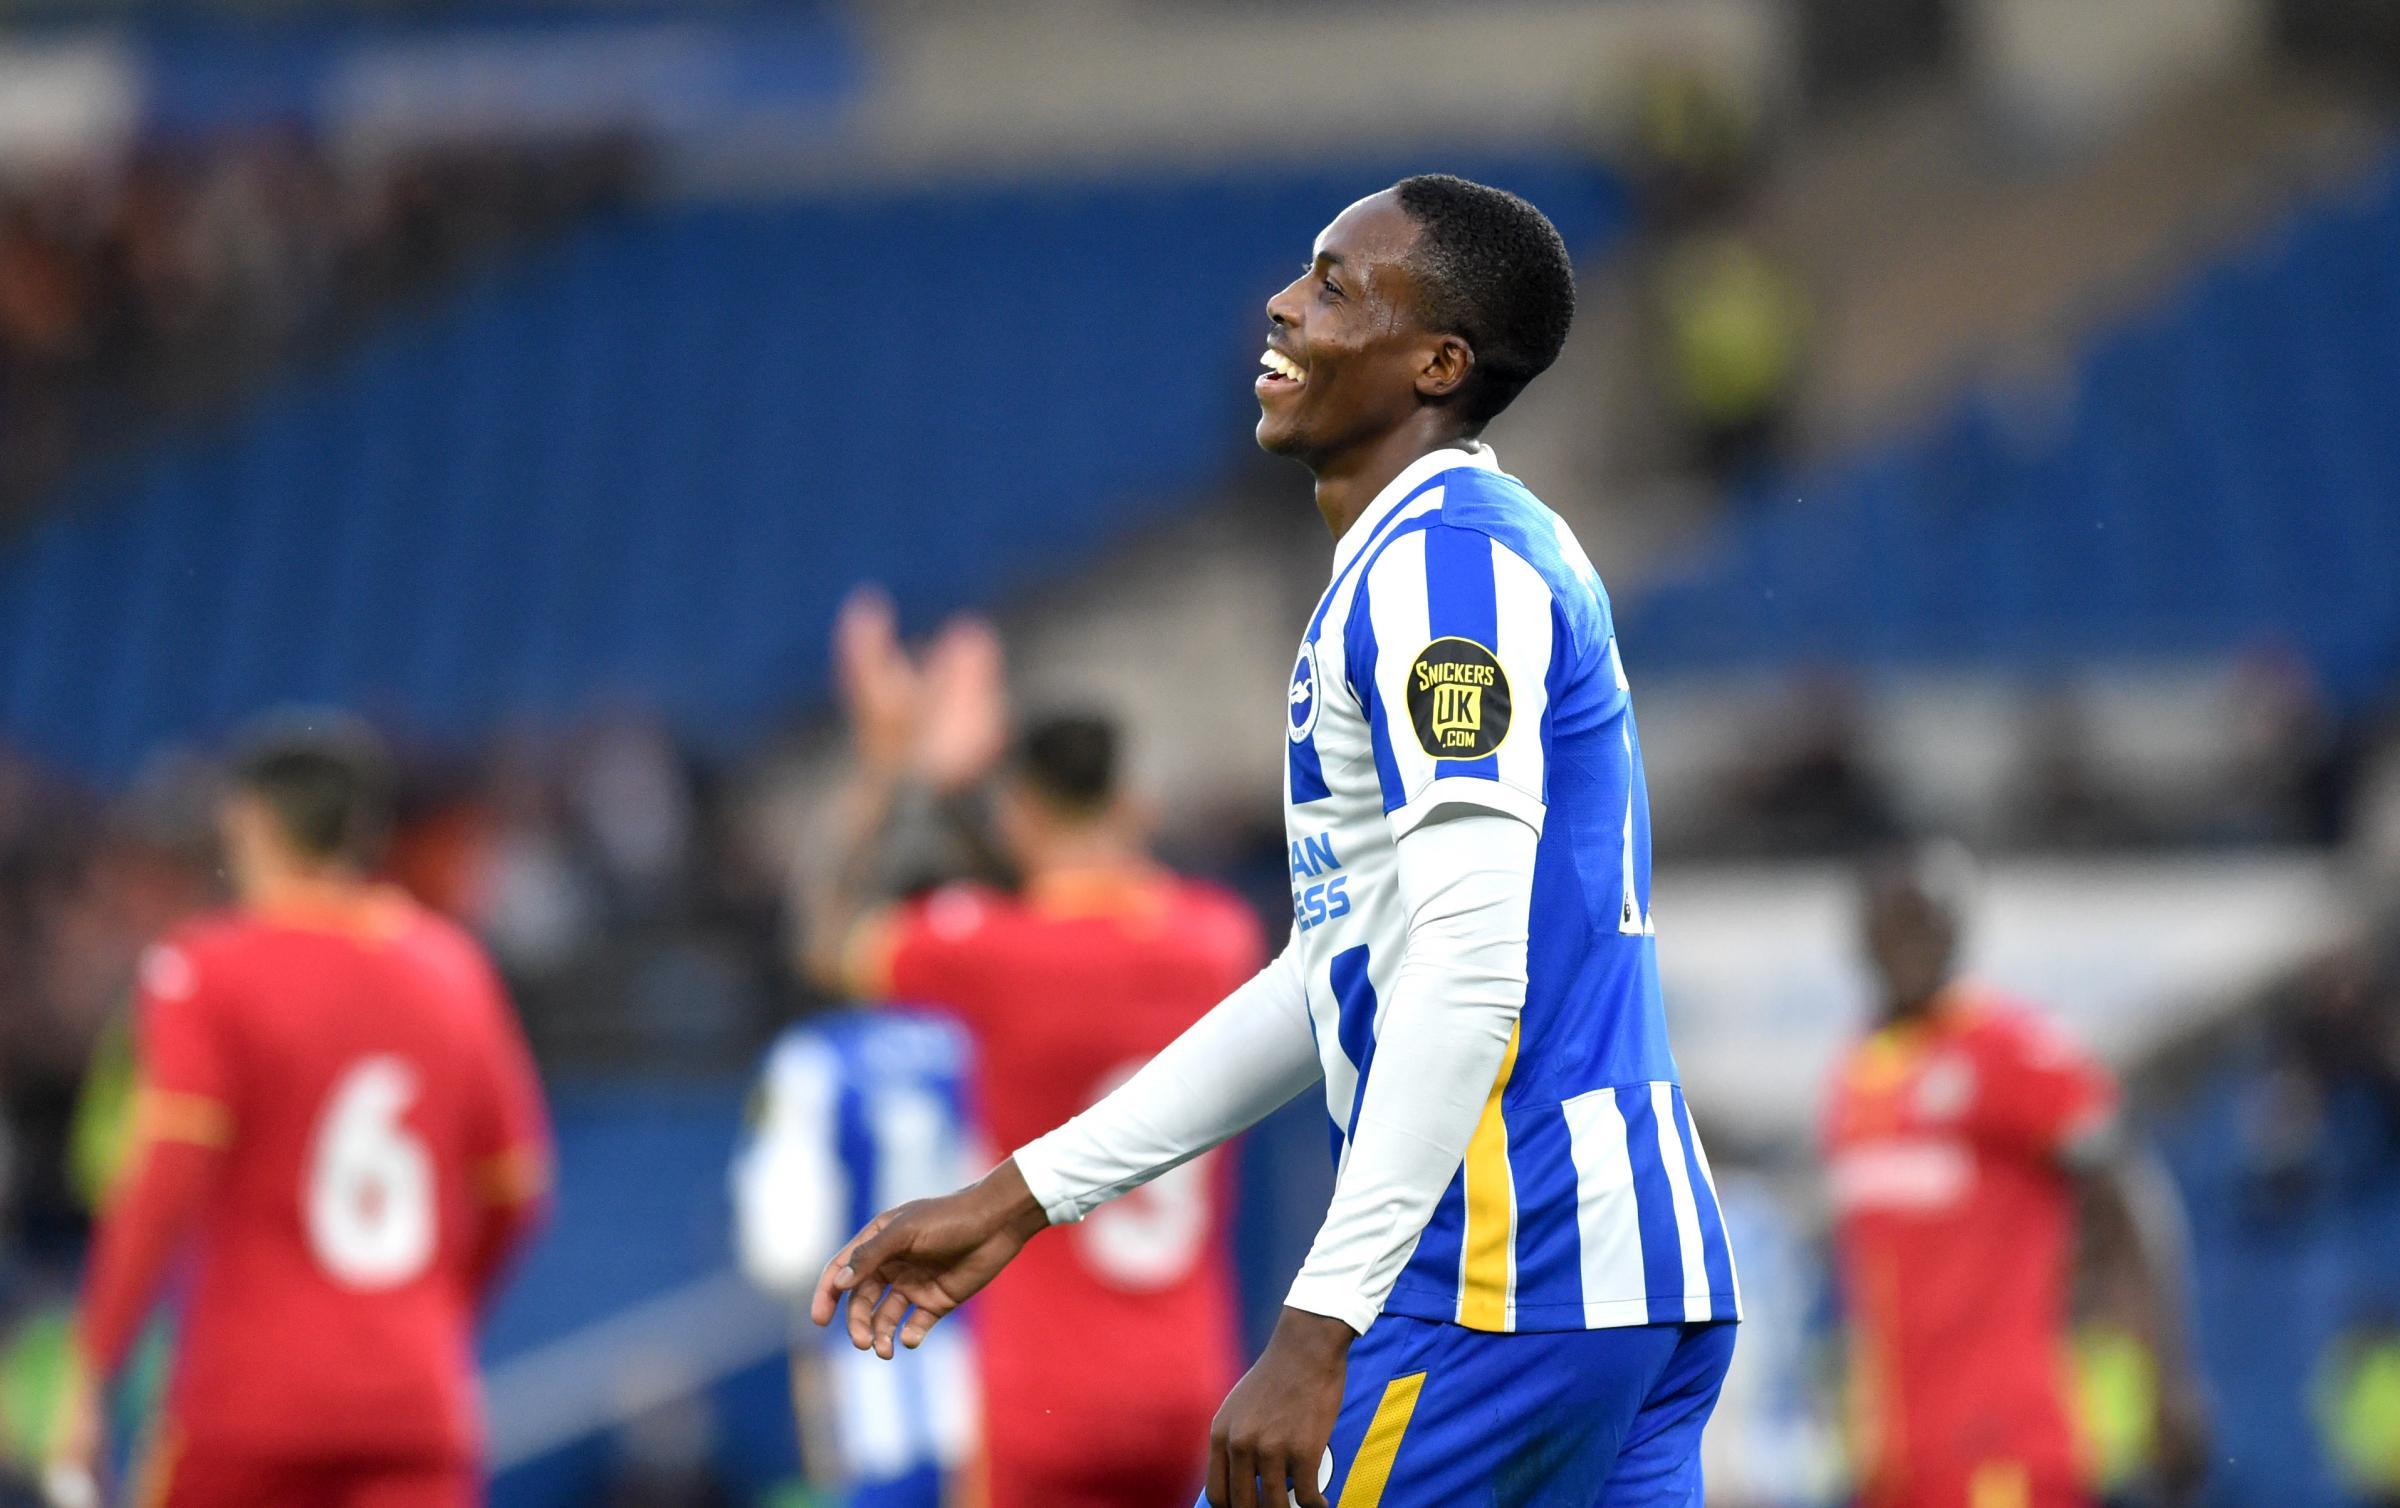 Brighton's Enock Mwepu earns praise from Graham Potter